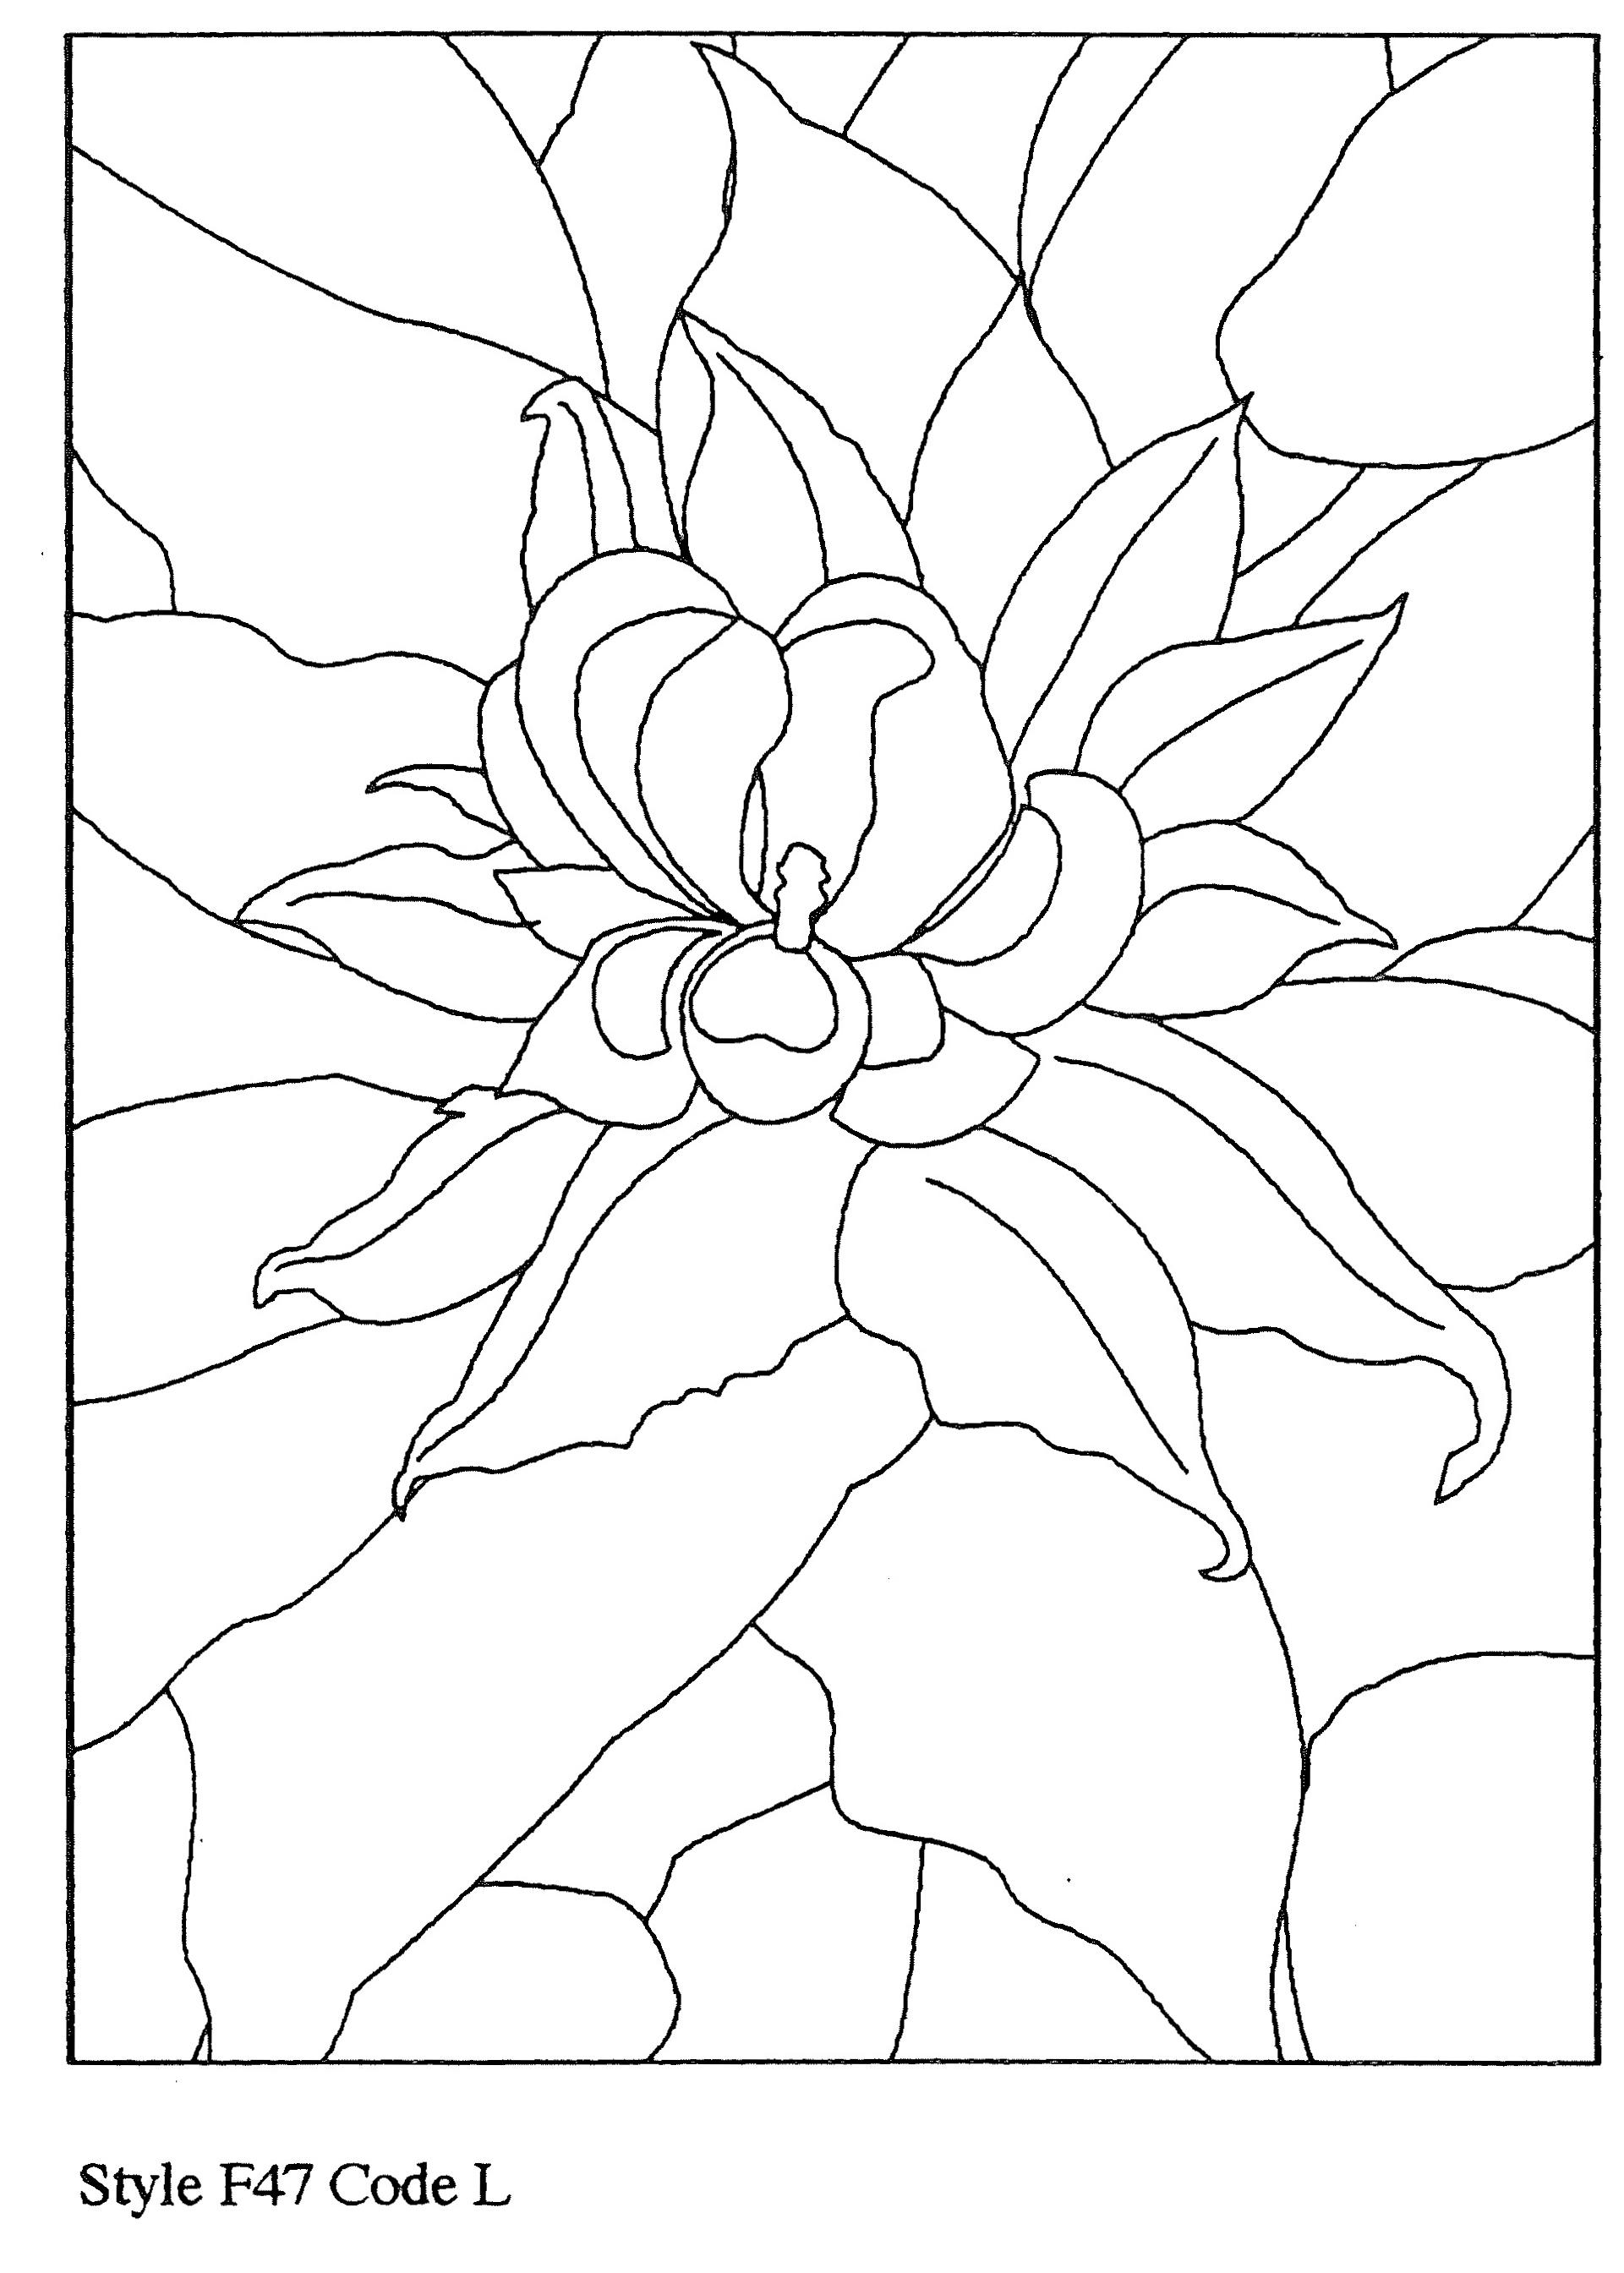 Page 27 copy 3.jpg